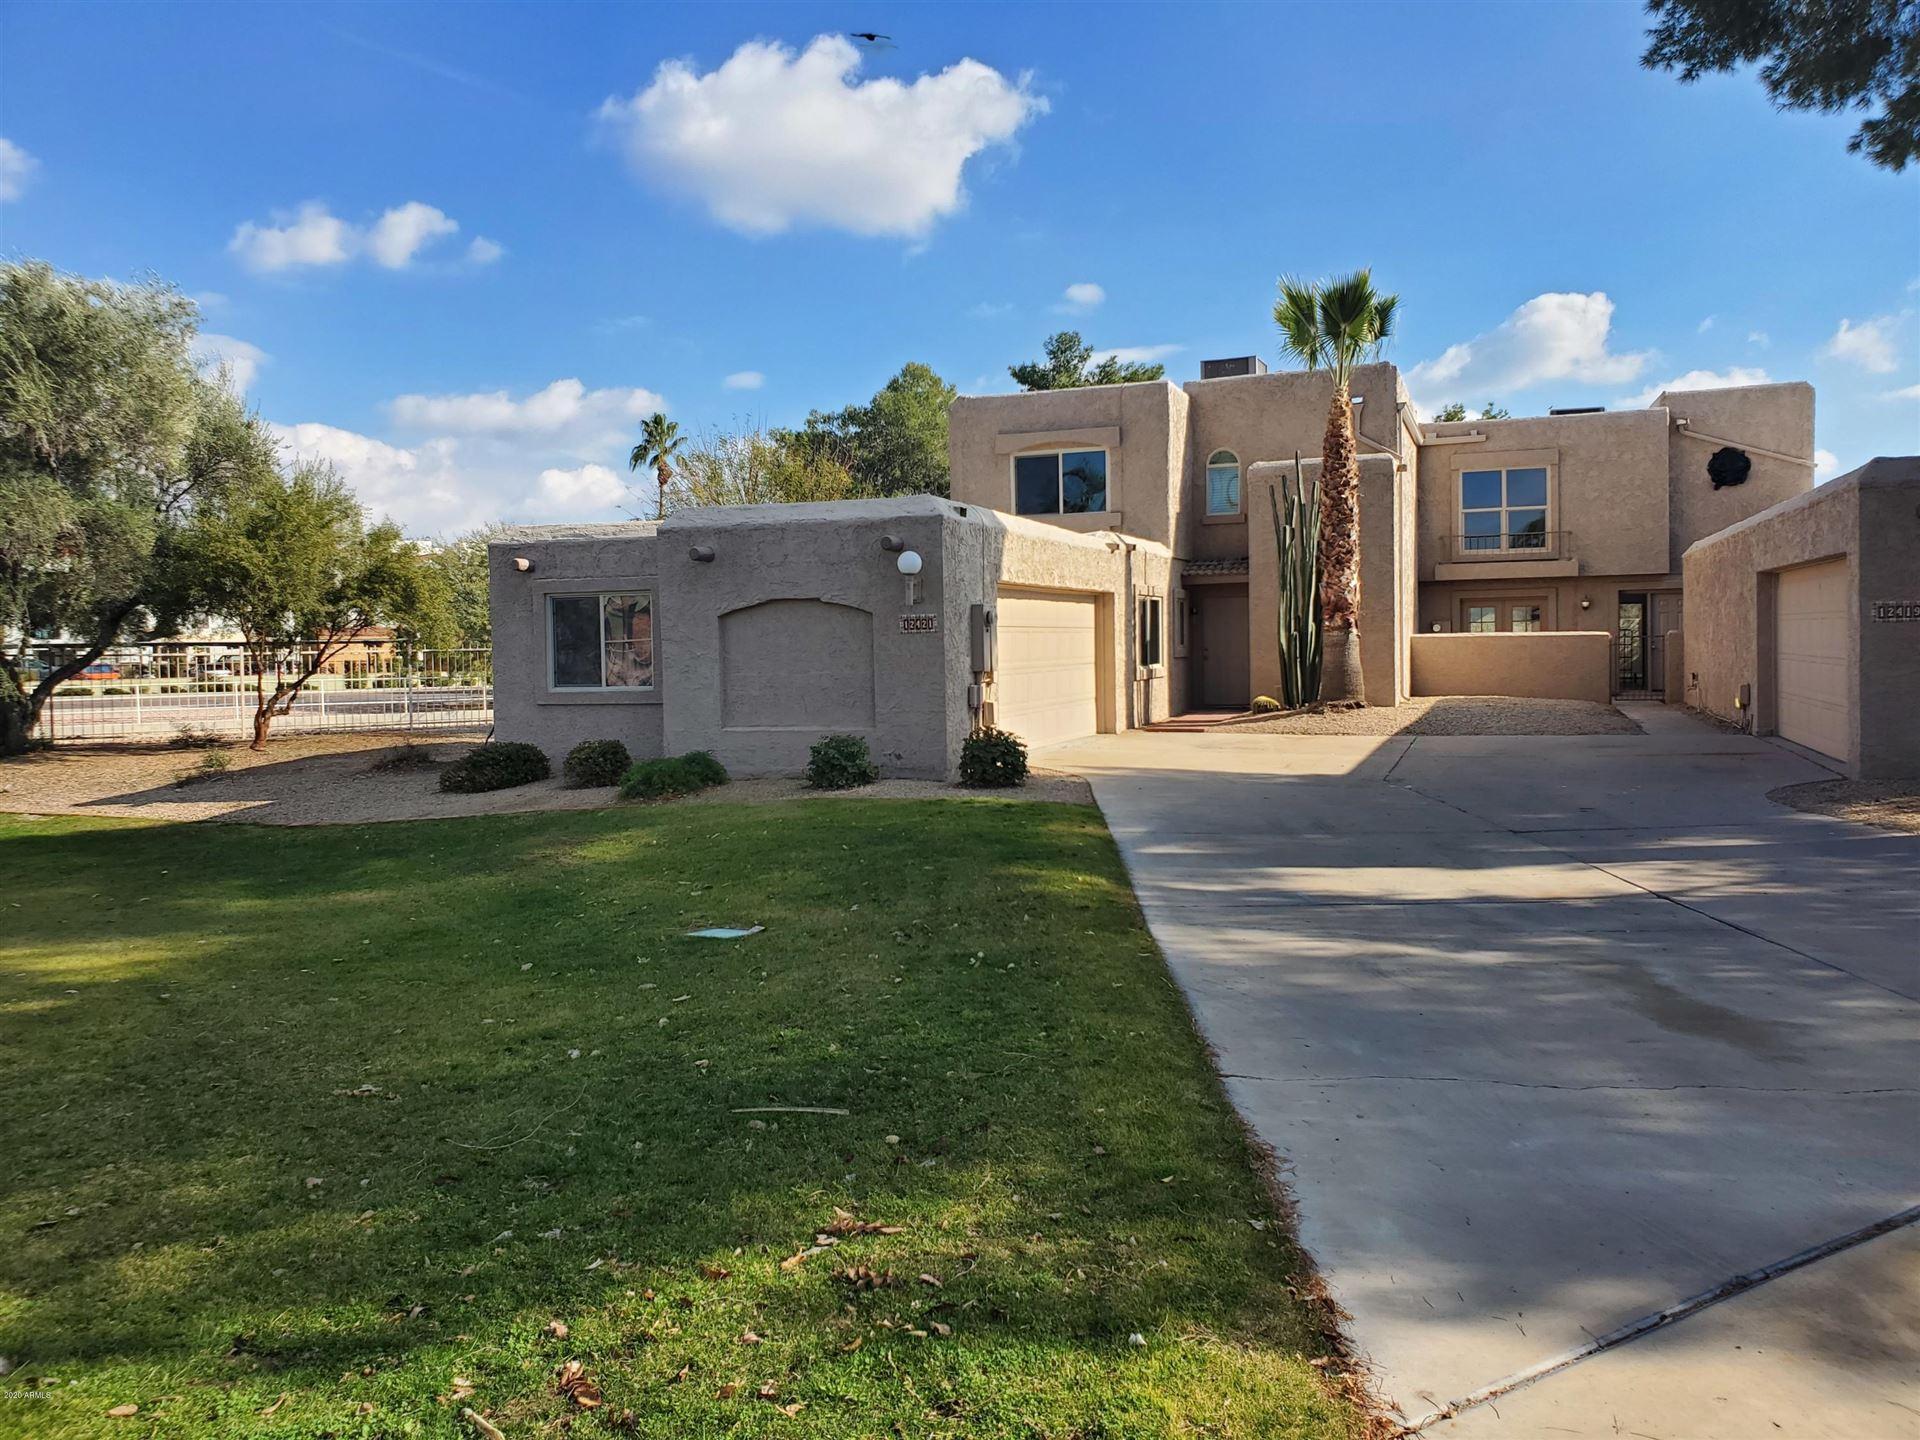 12421 N 41ST Place, Phoenix, AZ 85032 - MLS#: 6036587